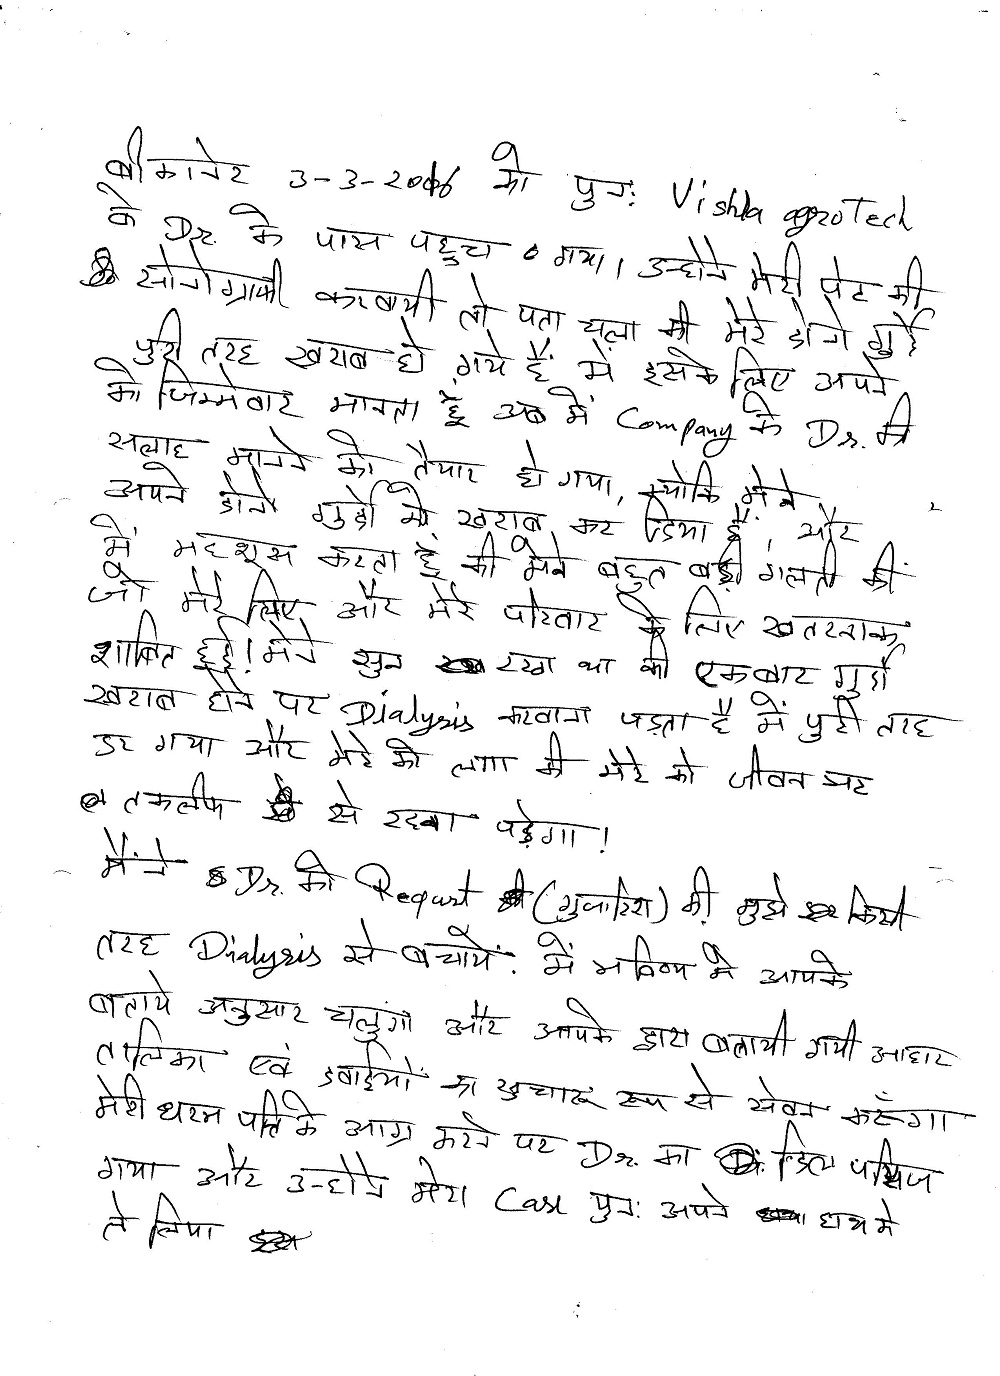 randeep-kumar-kaura-fatty-liver-kindey-failure-patient-treatment-5